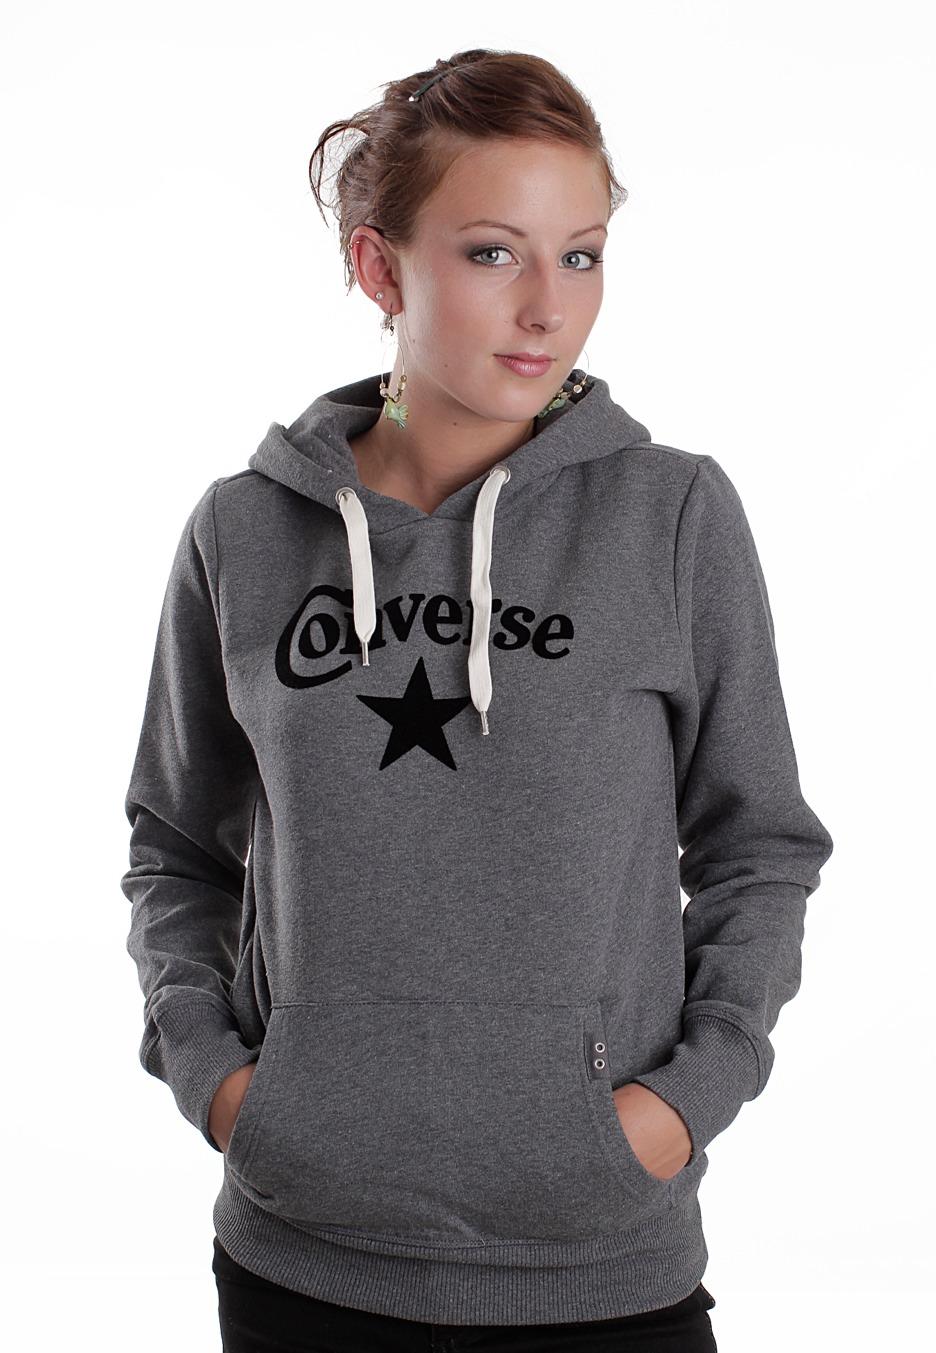 Girl hoodies